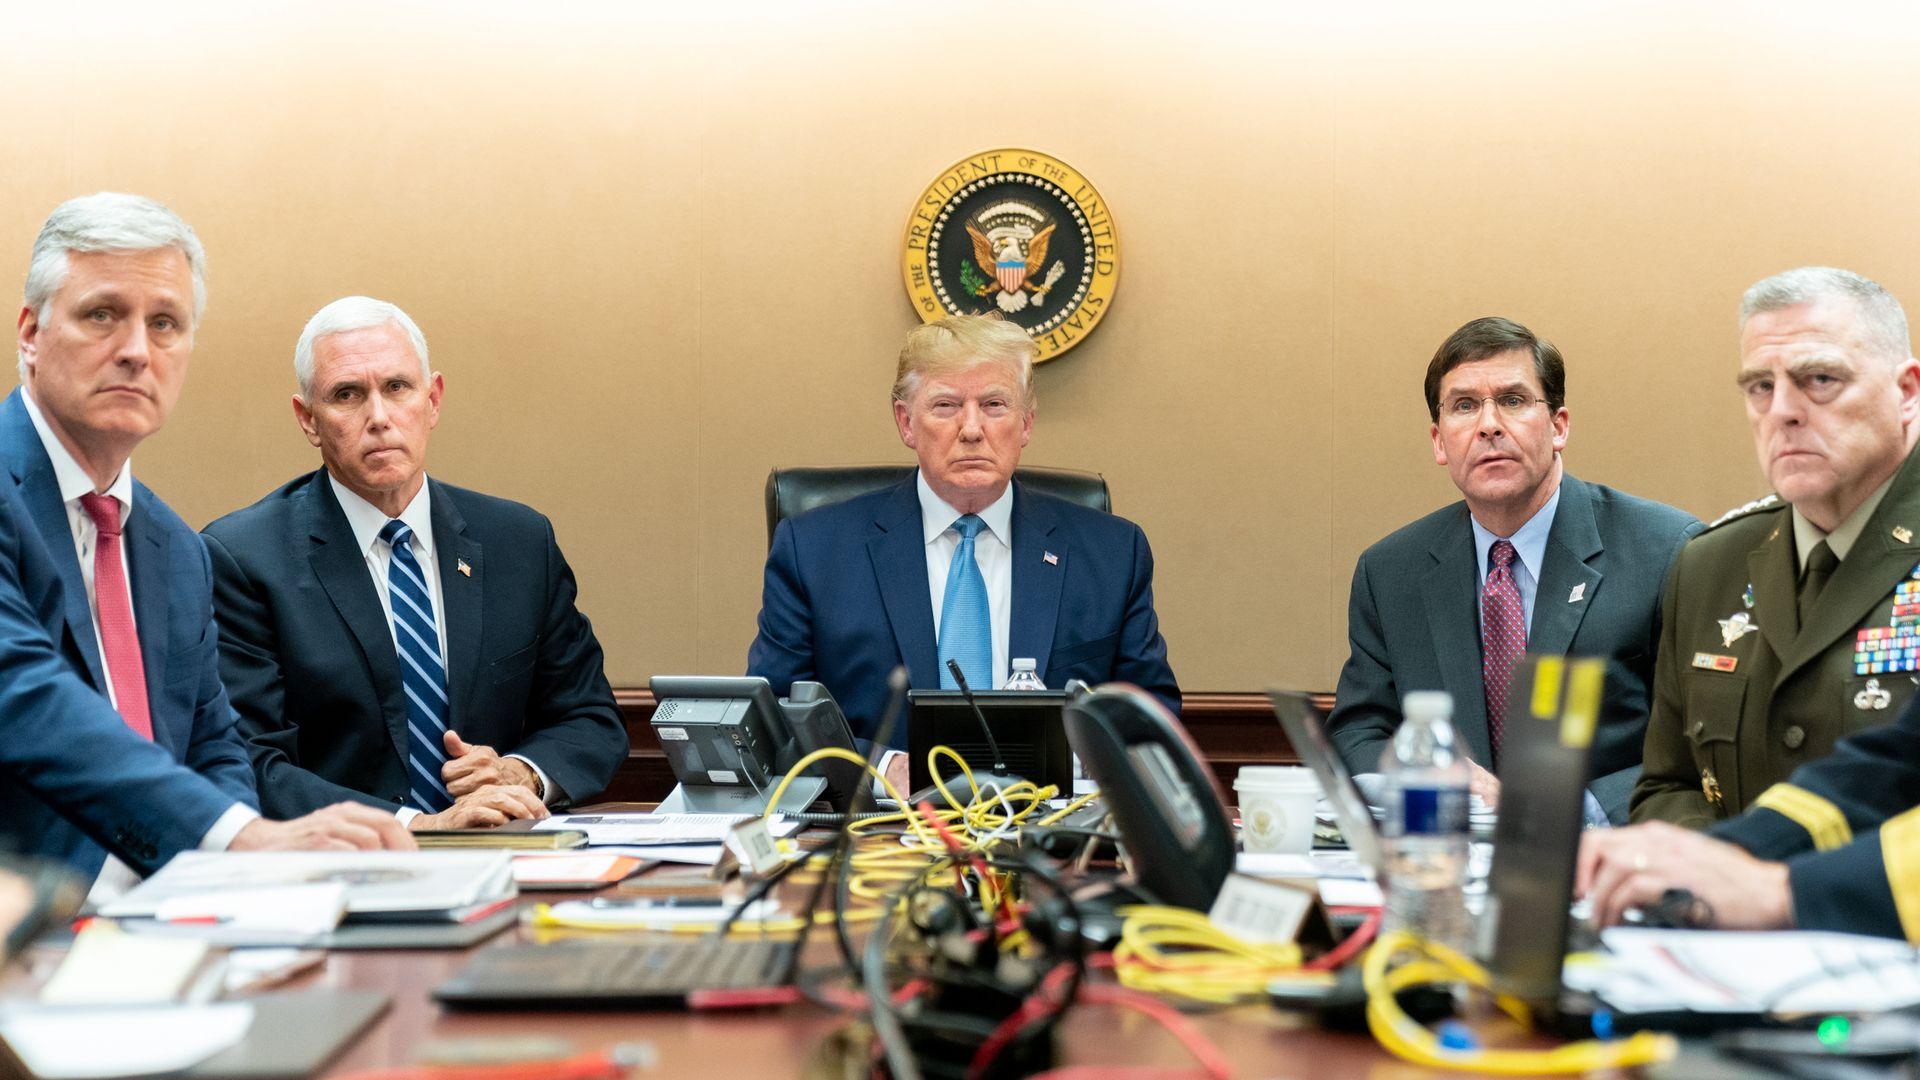 Trump with White House officials monitoring Baghdadi raid